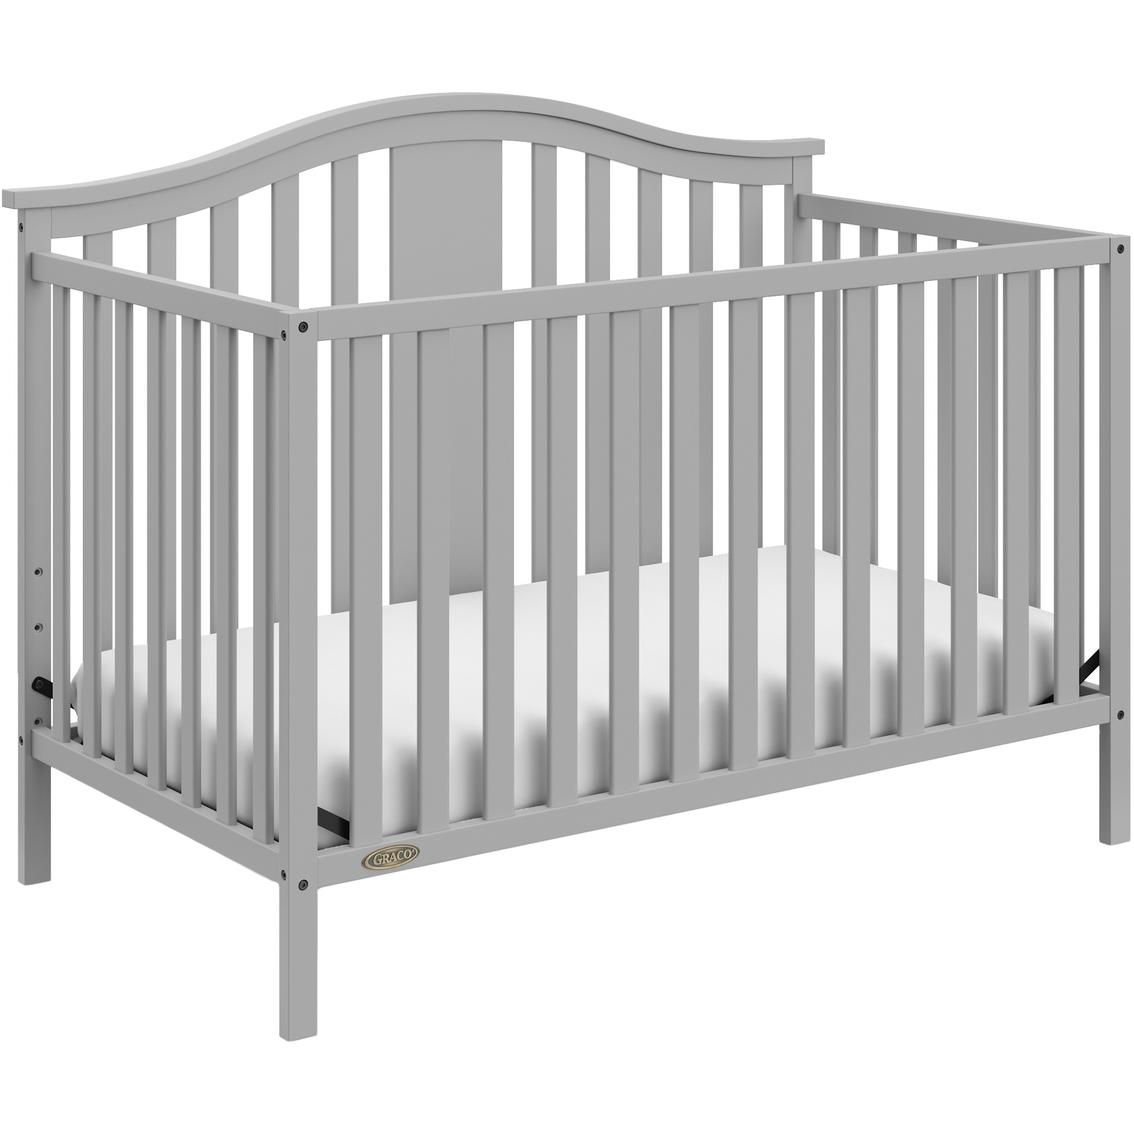 Graco Solano 4 In 1 Convertible Crib Cribs Baby Toys Shop The Exchange